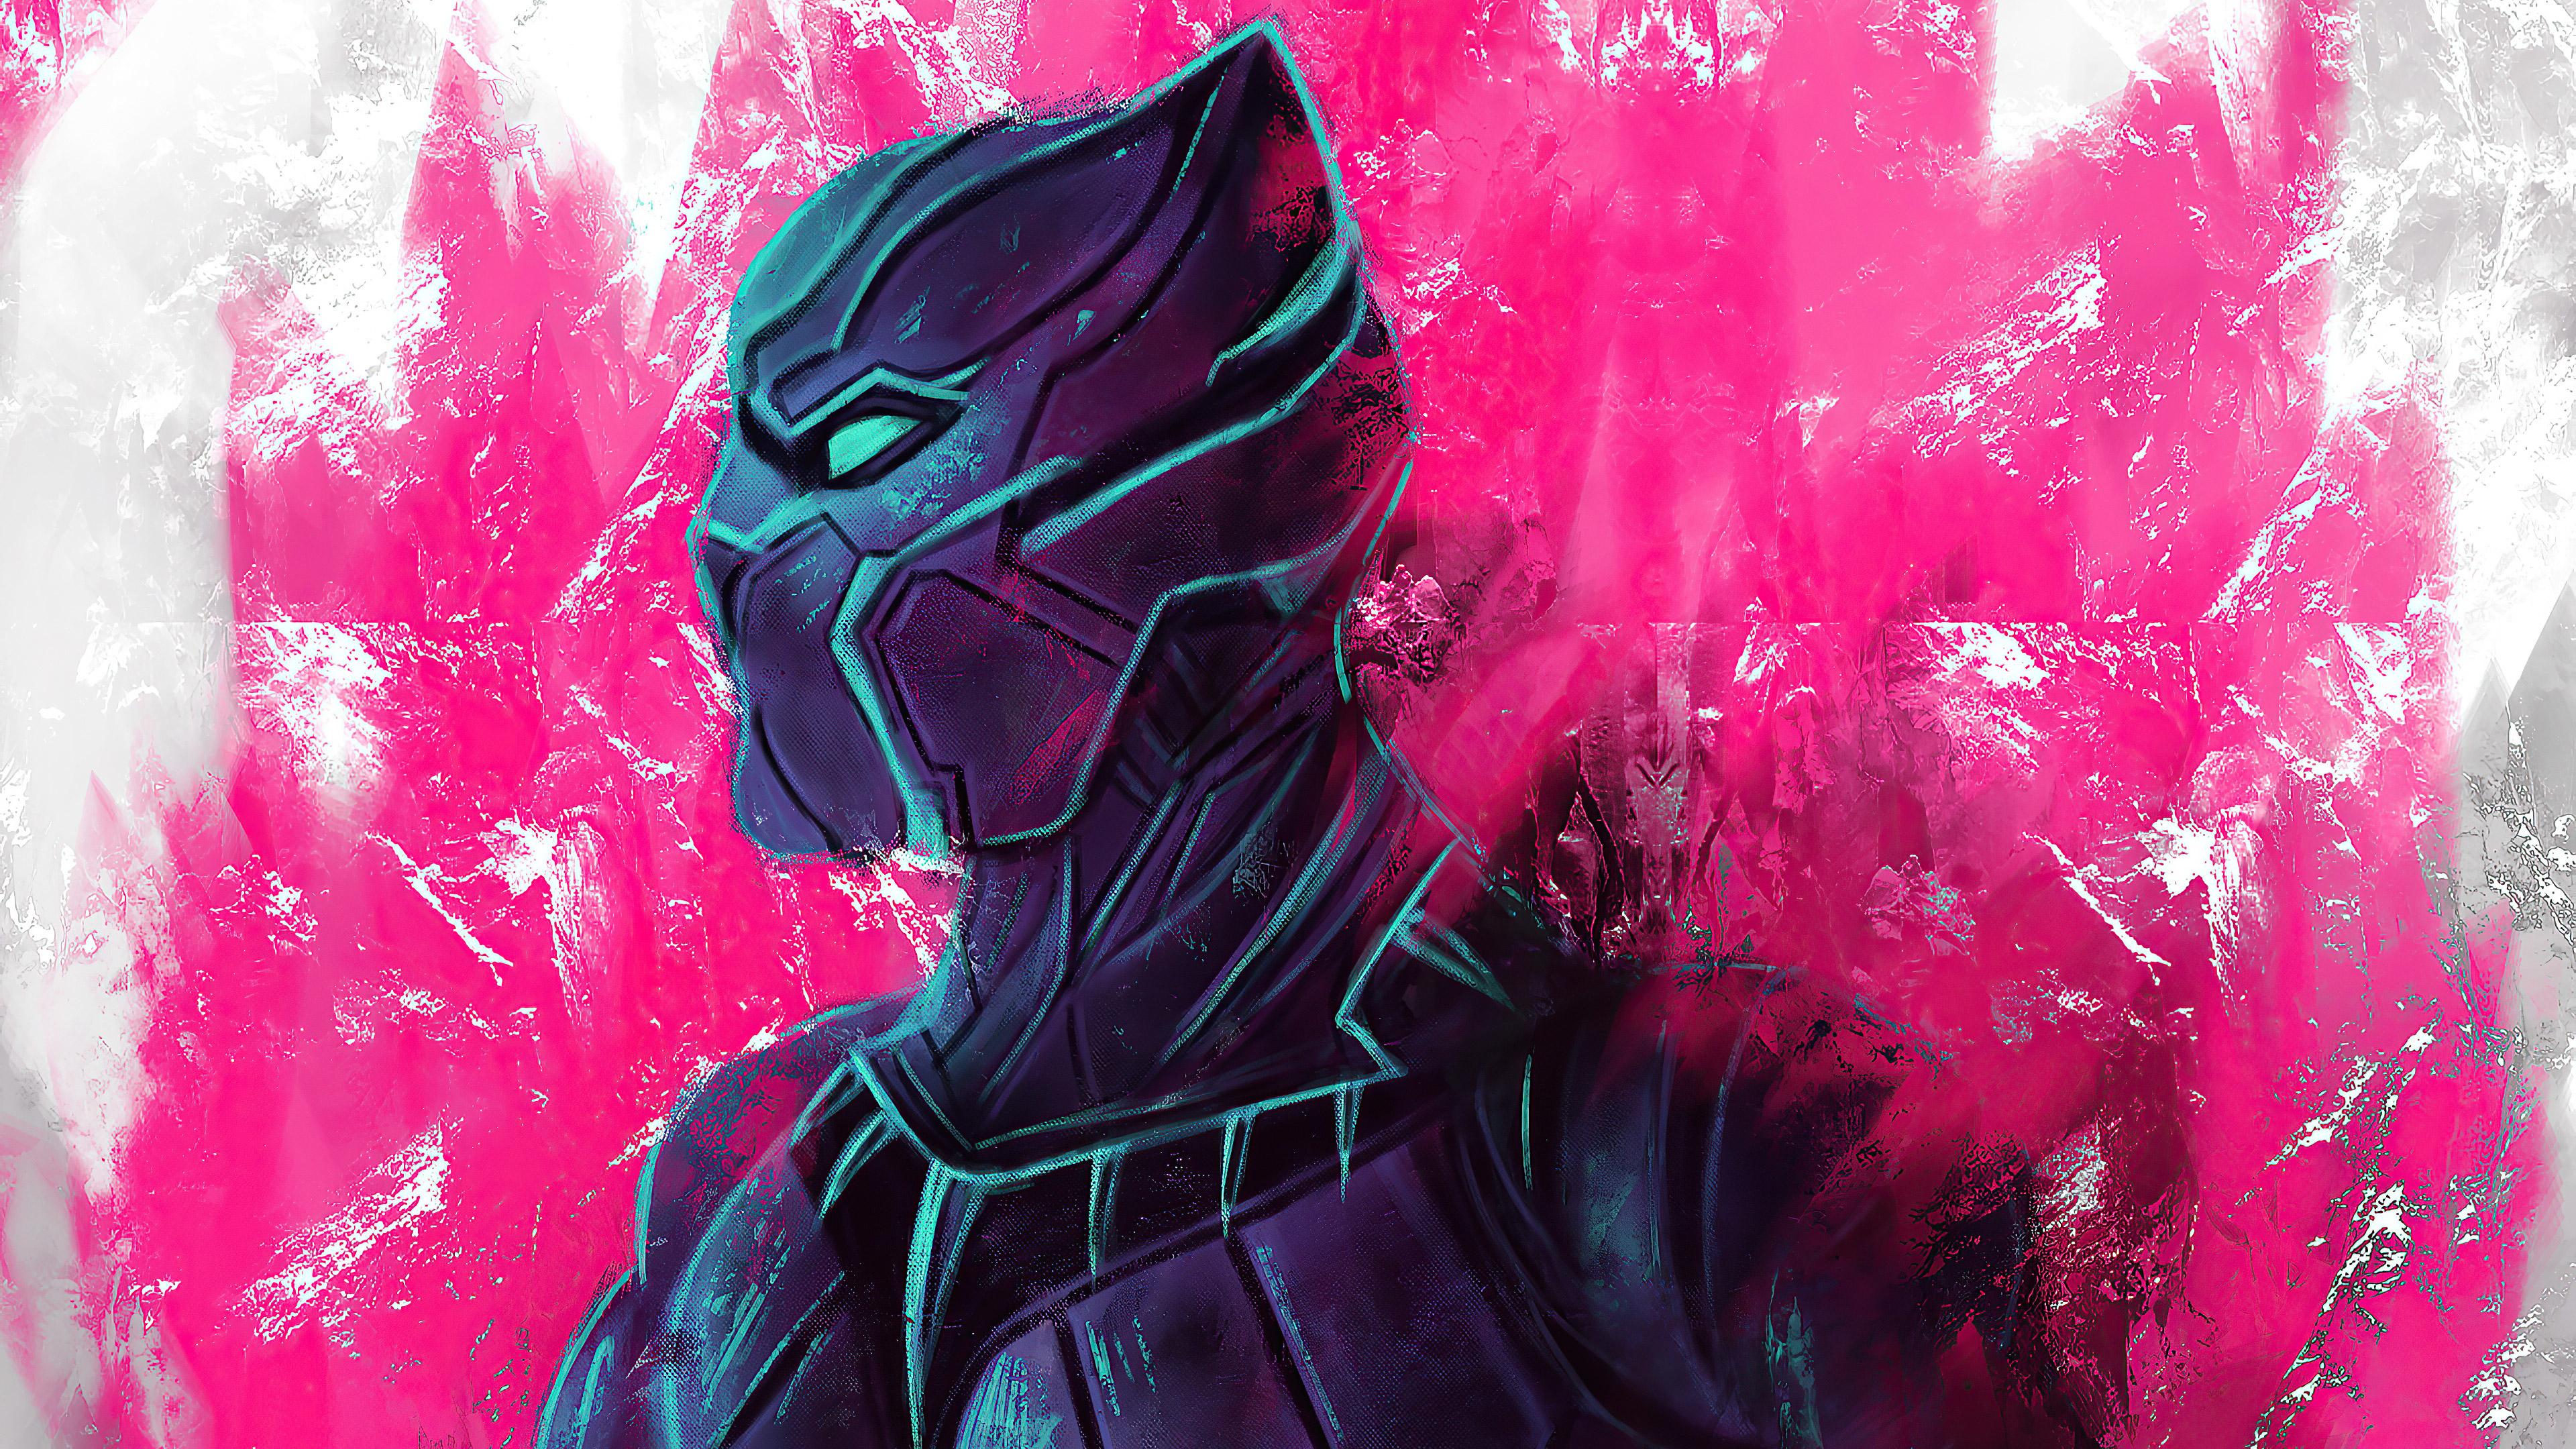 Black Panther Marvel Comic Wallpaper, HD Superheroes 4K ...